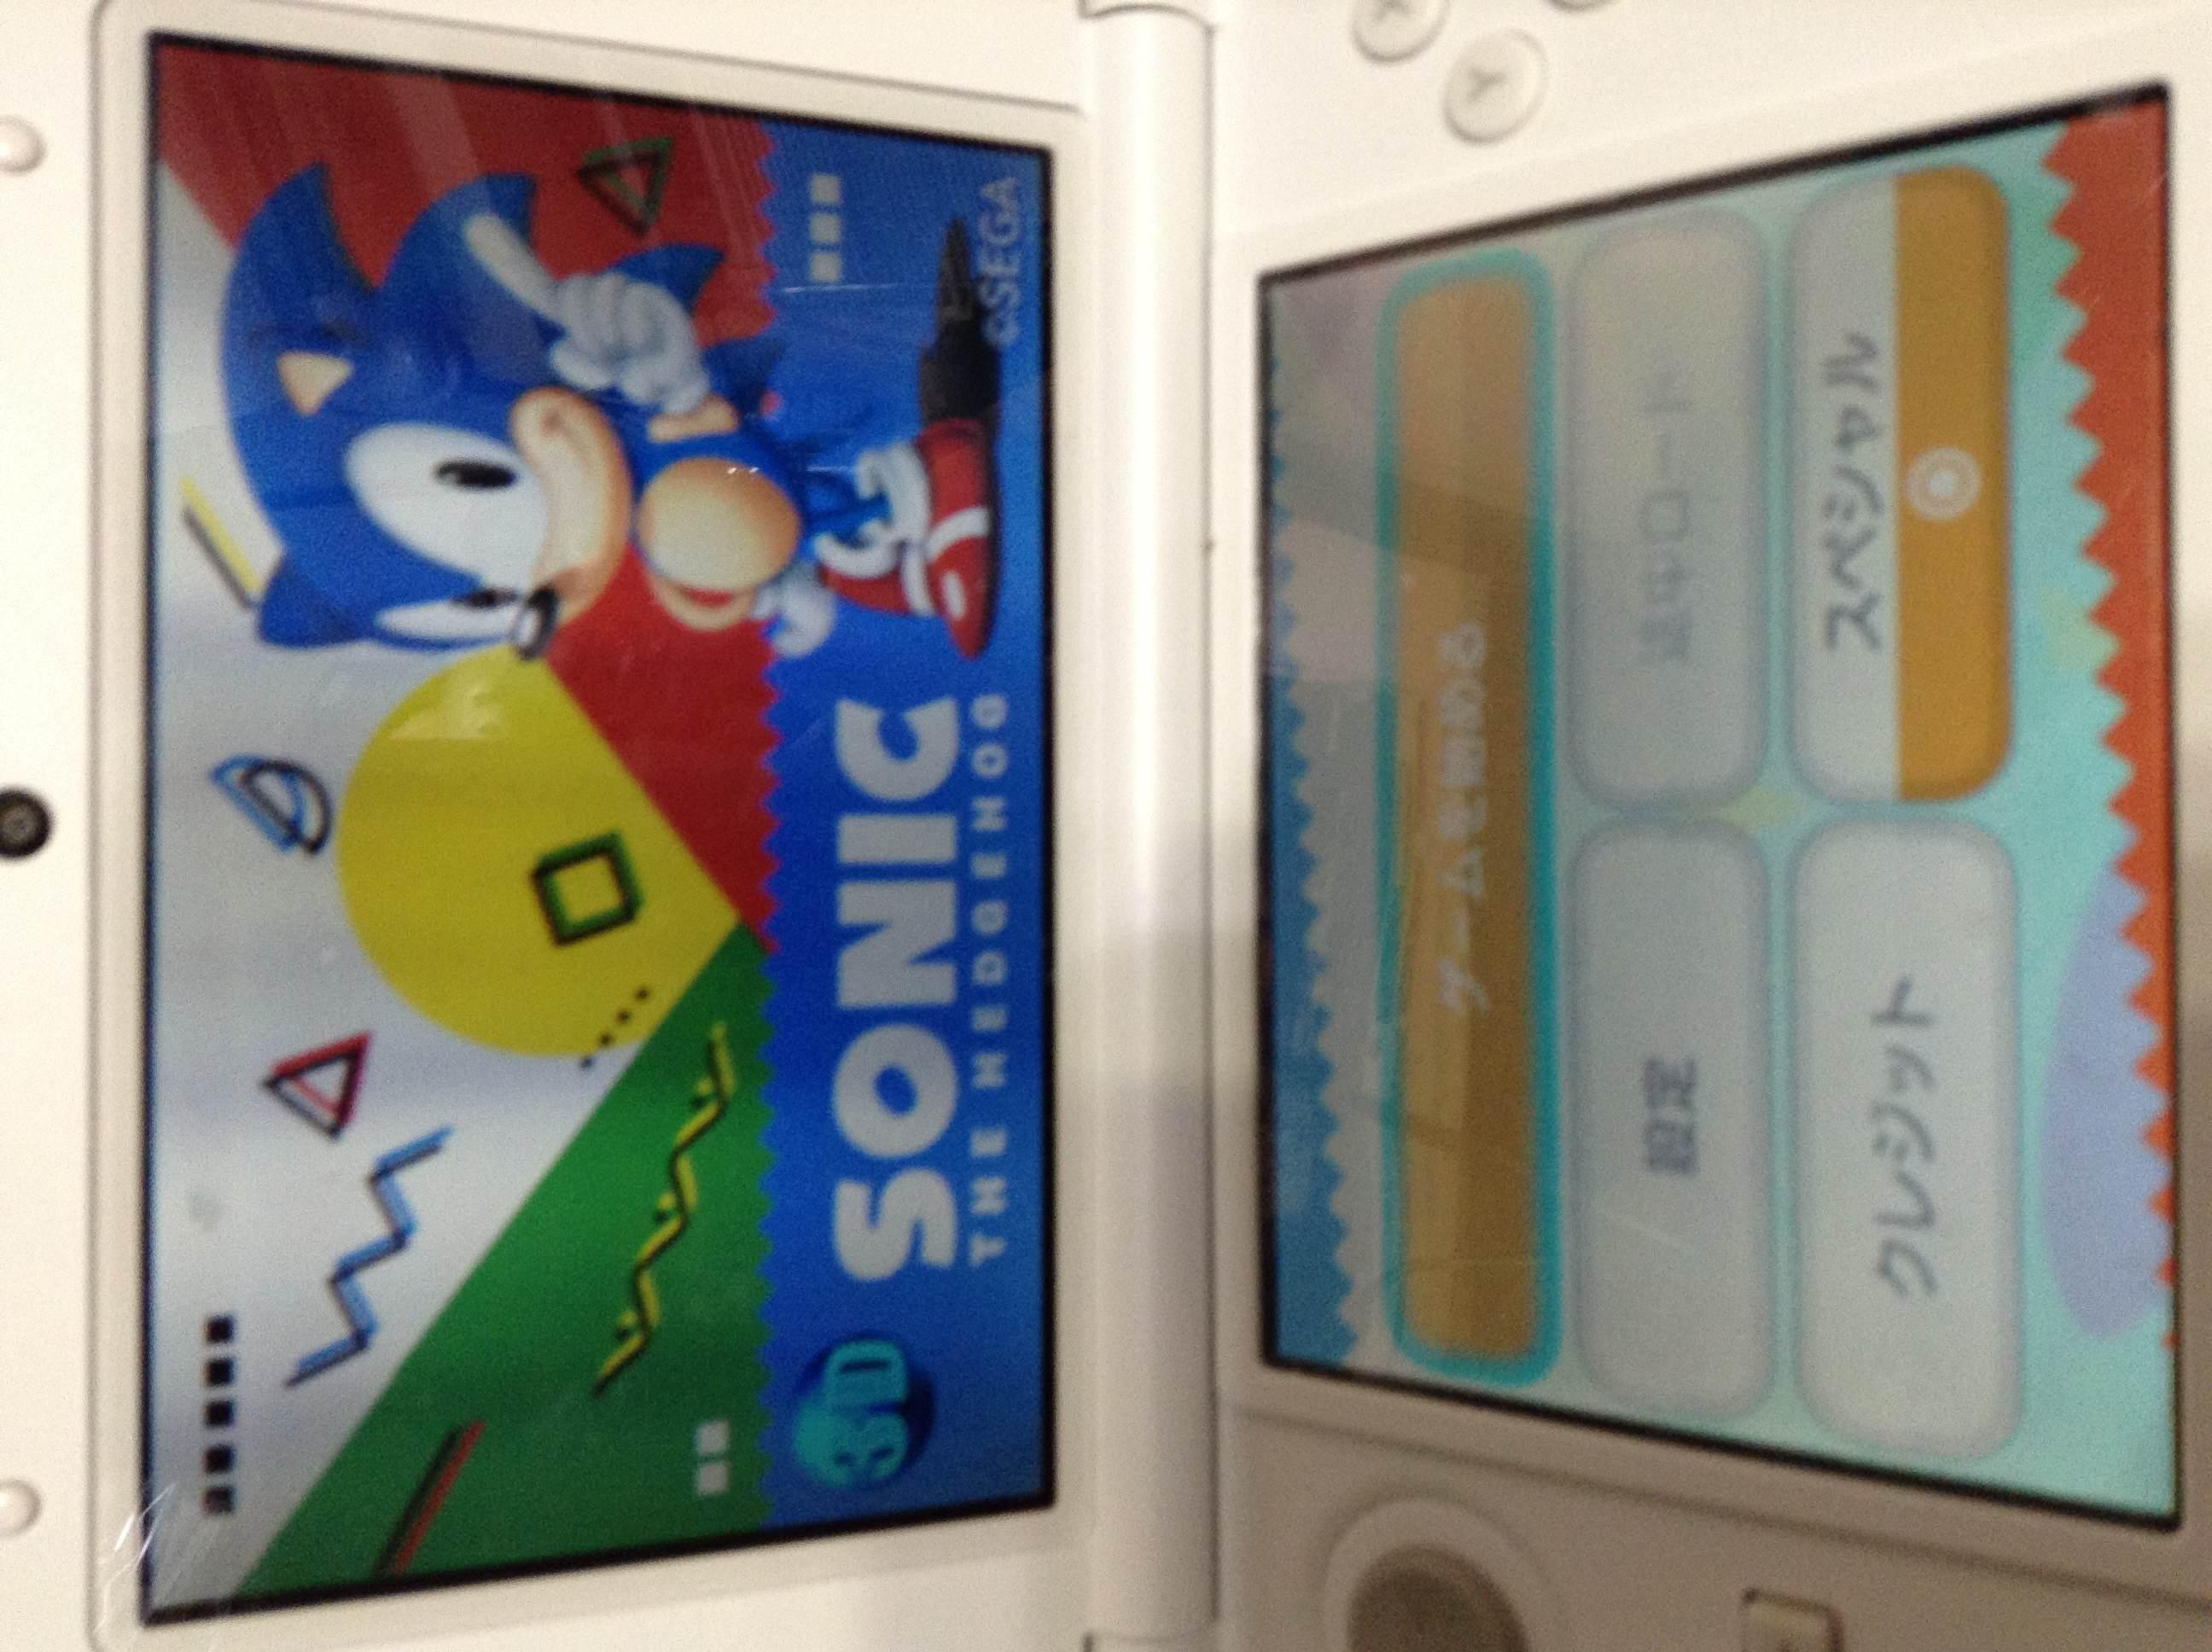 1/2013071213025103-photo-small.jpg